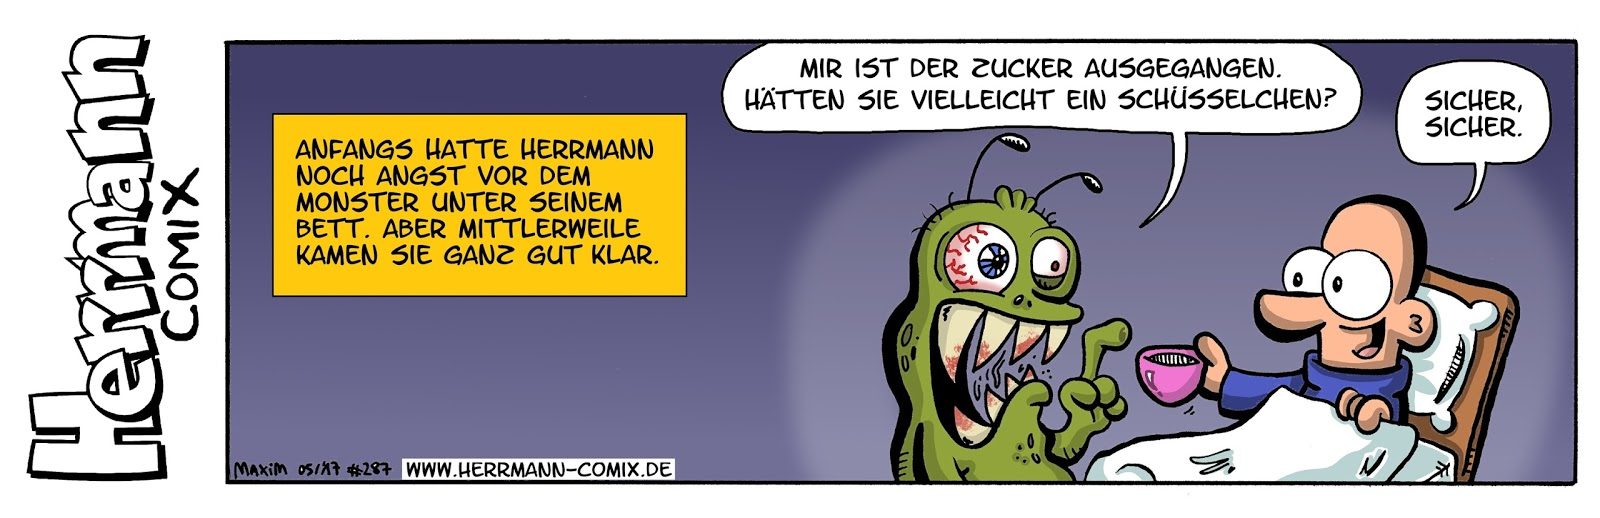 Peng Comicpreistrager Maxim Seehagen Zeigt Mir Seine Favourite